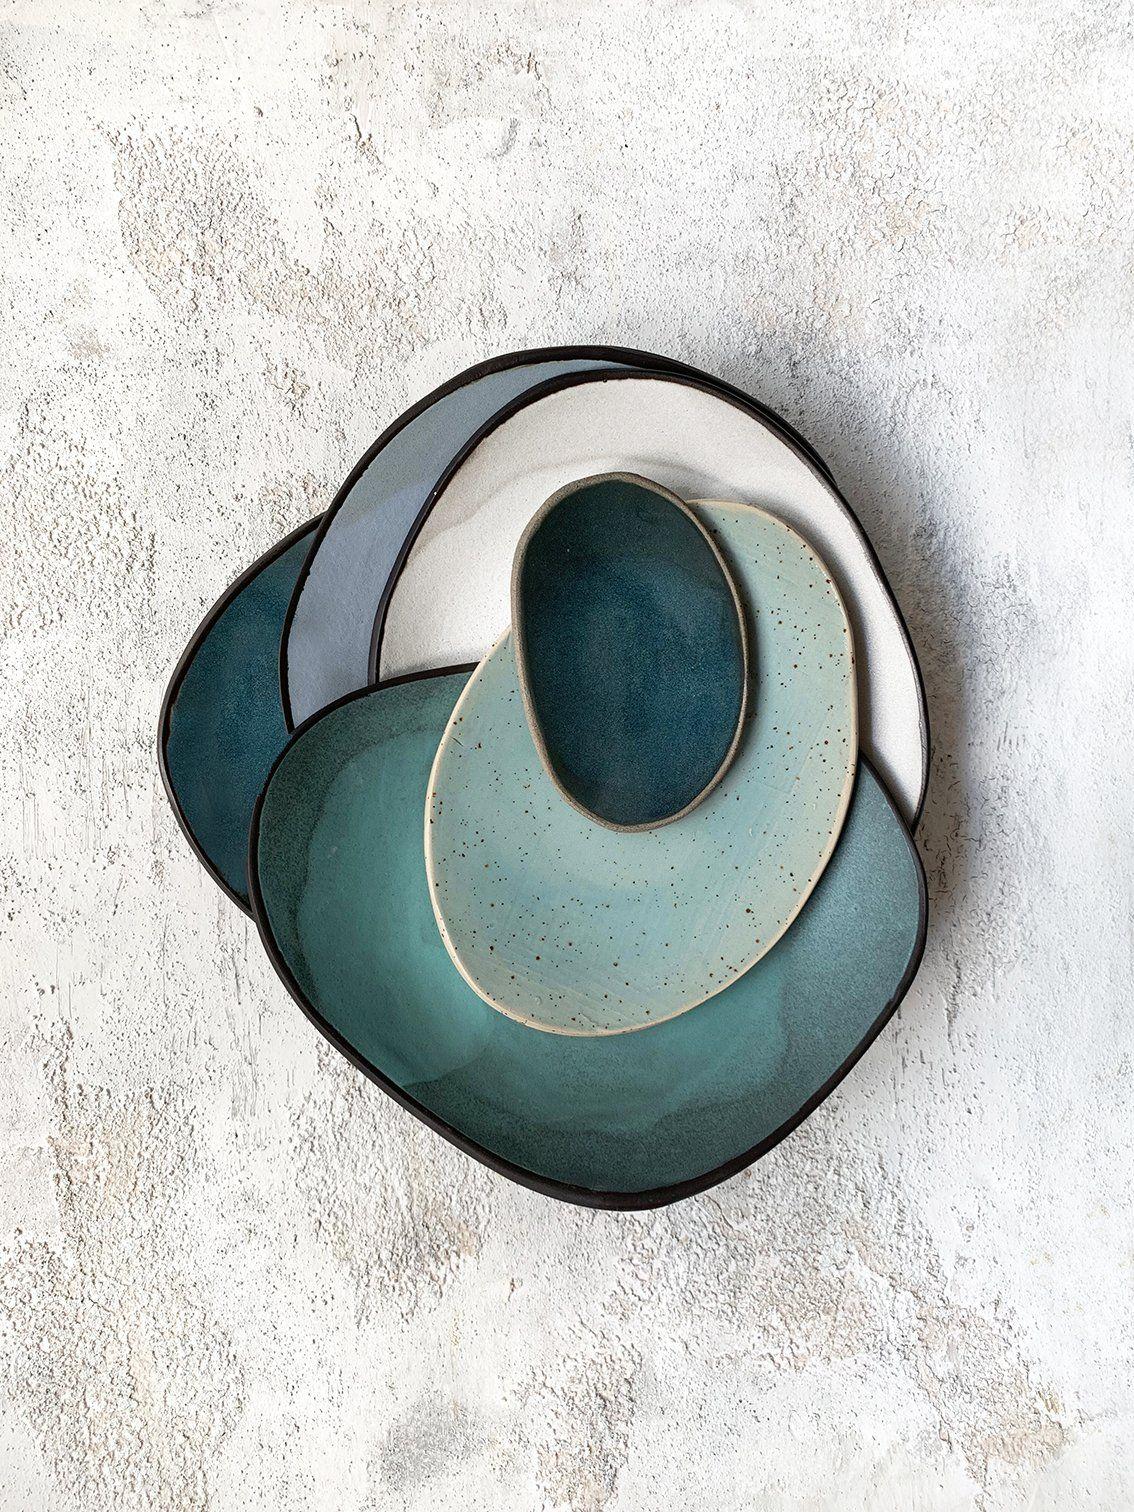 Keramik #handmade #geschirr #teller #blau #grau #grün #ceramics #ton #diy